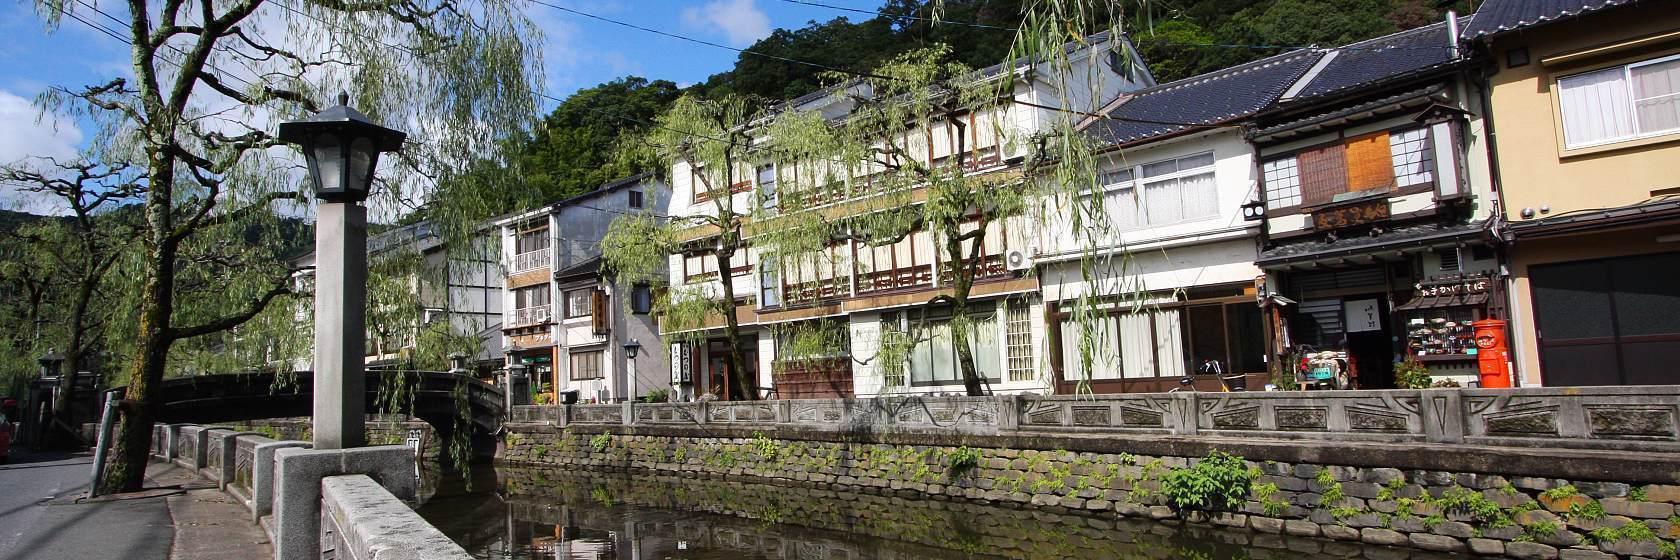 Kinosaki Onsen Travel Guide